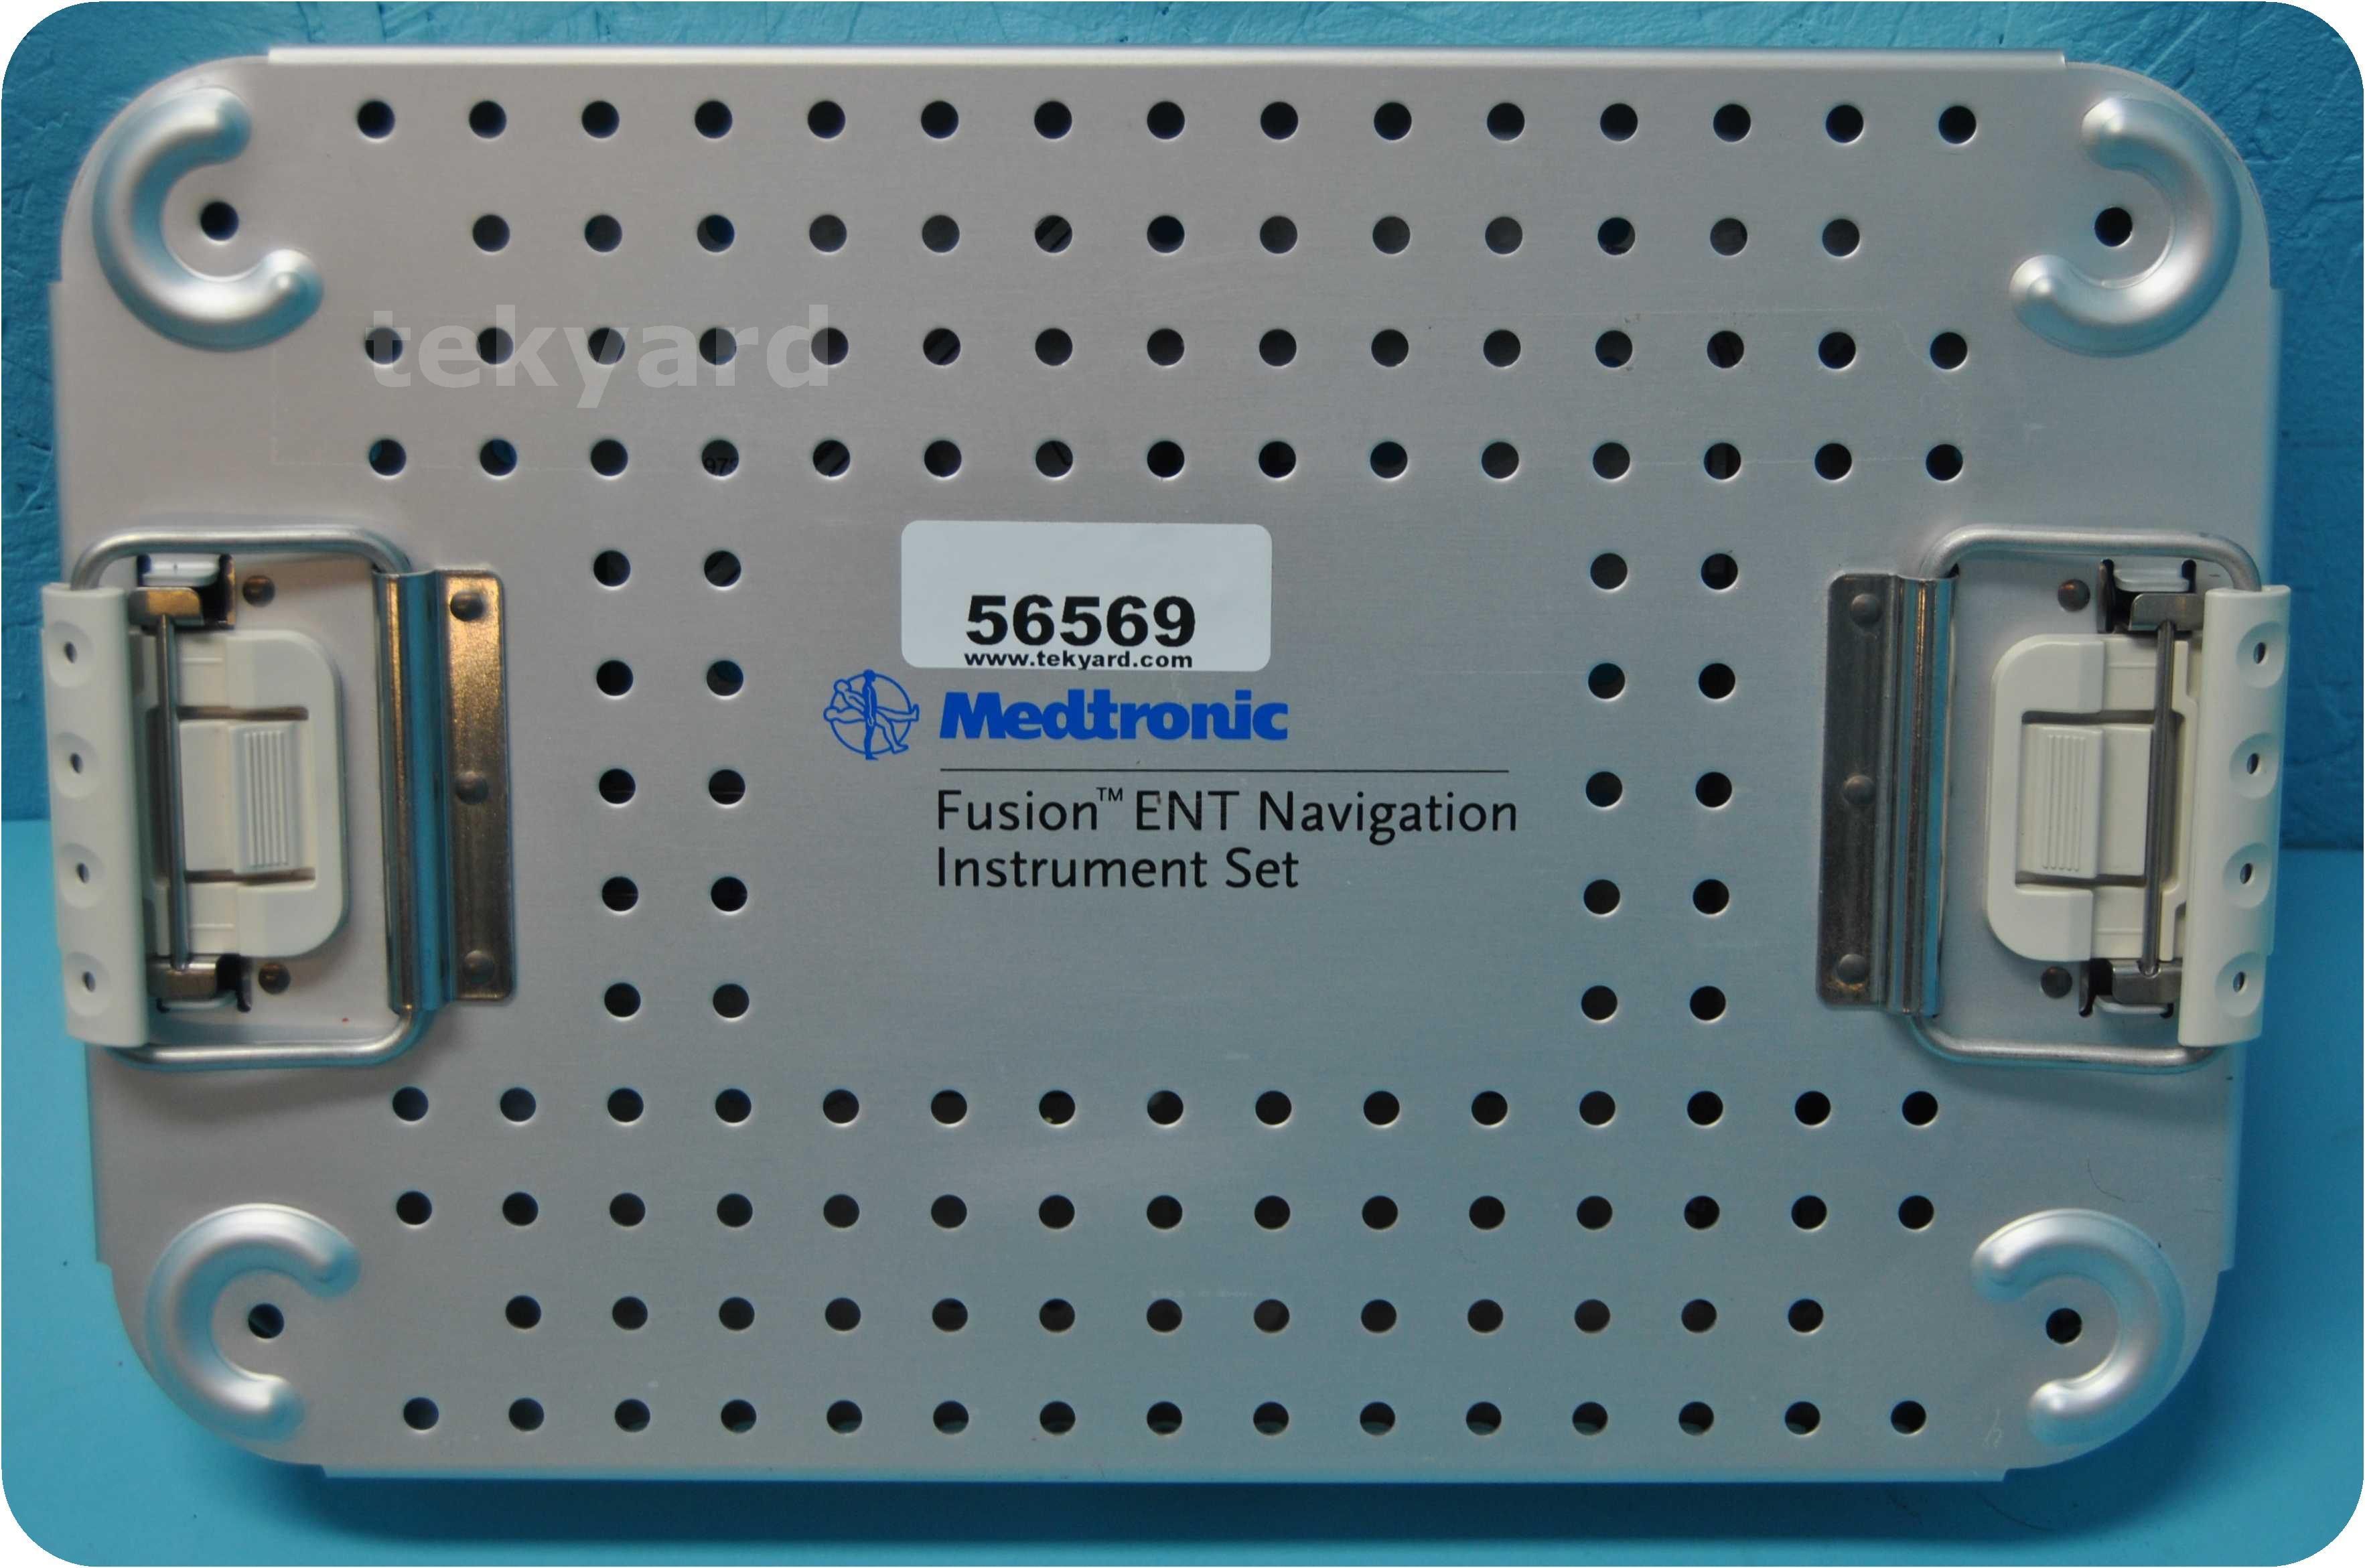 tekyard, LLC  - Medtronic Fusion ENT Navigation Instrument Set